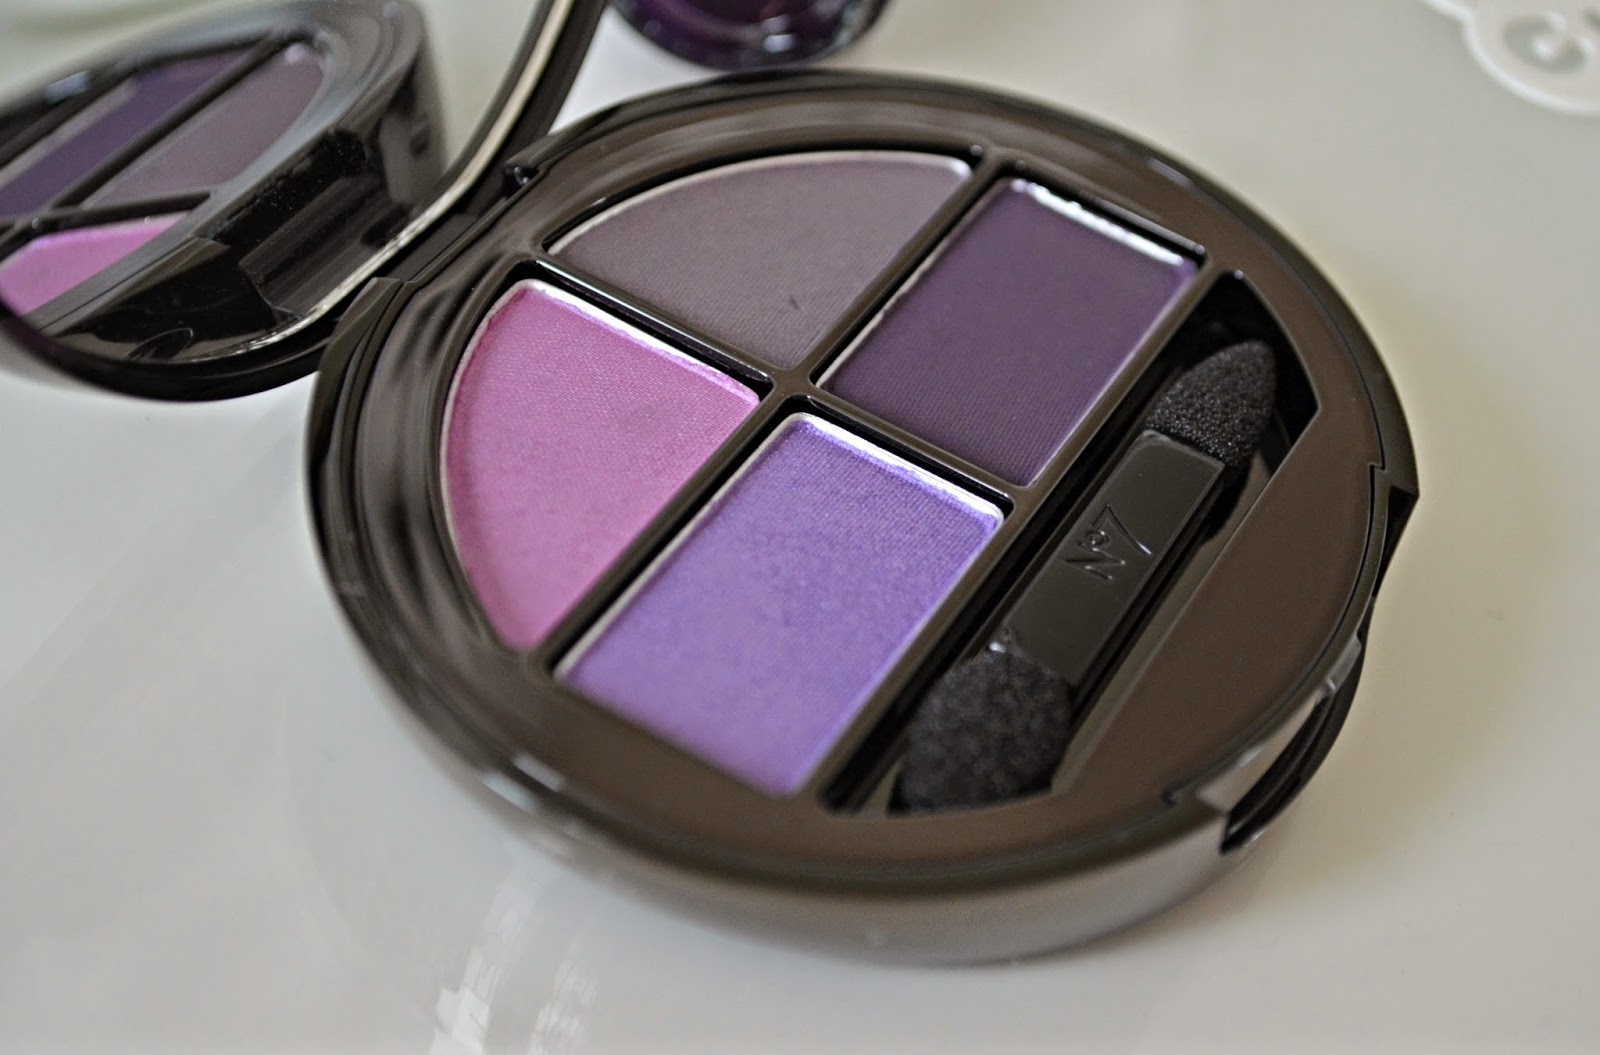 No7 Stay Perfect Eyeshadow Quad in Purple Haze